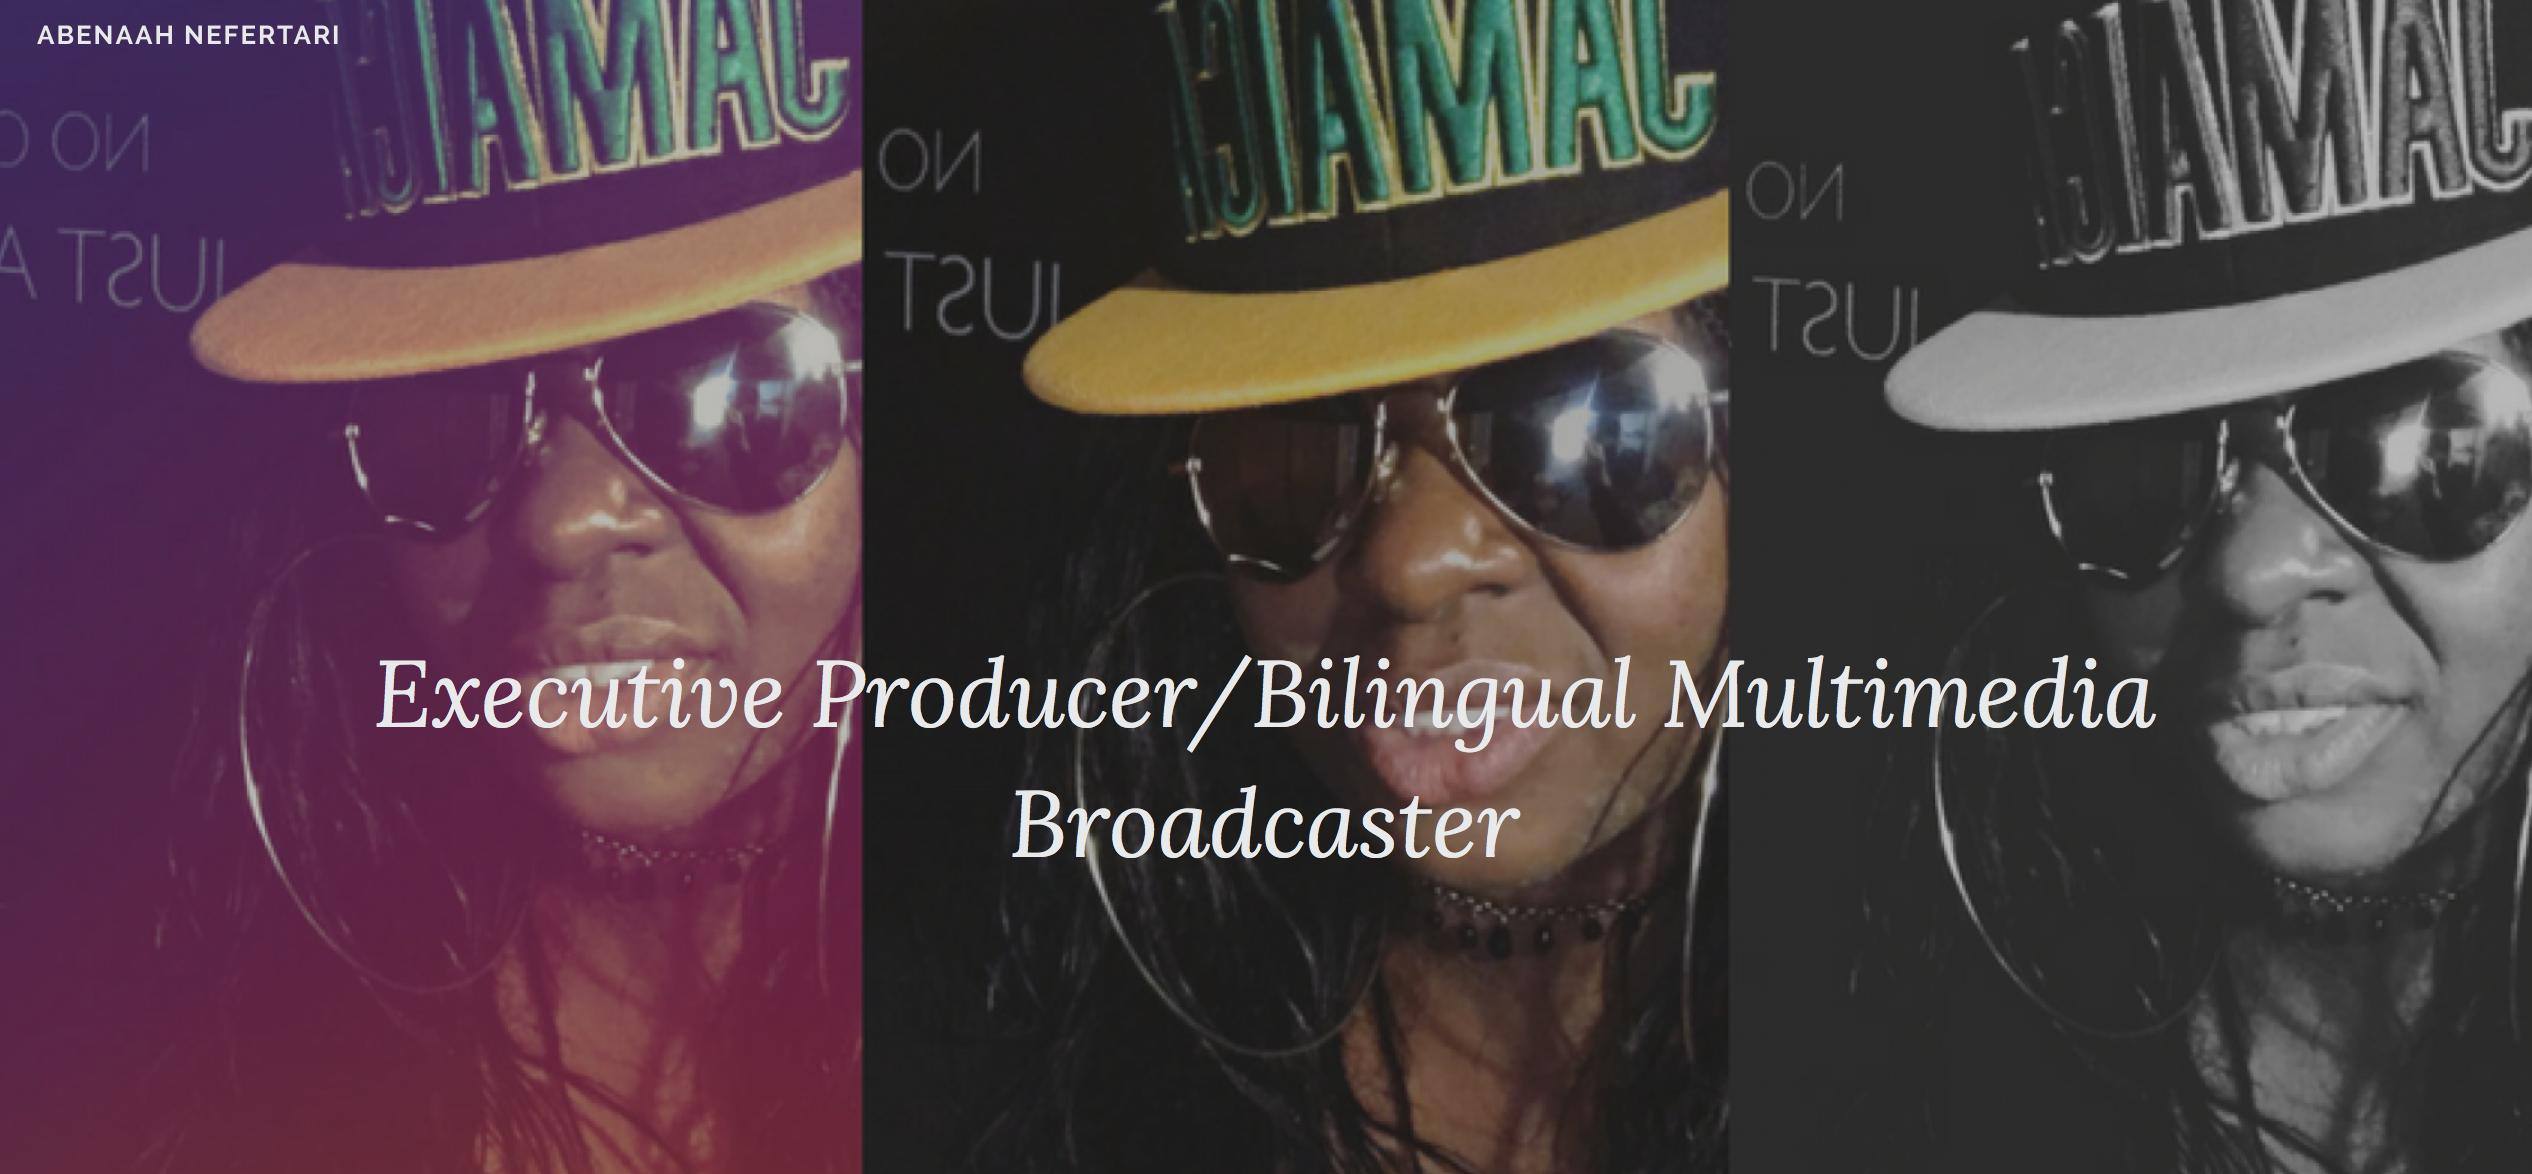 Meet Creator of No Critics @JustArtists , 🎬Executive Producer & Bilingual Multimedia Broadcaster📡www.AbenaahNefertariOfficial.com